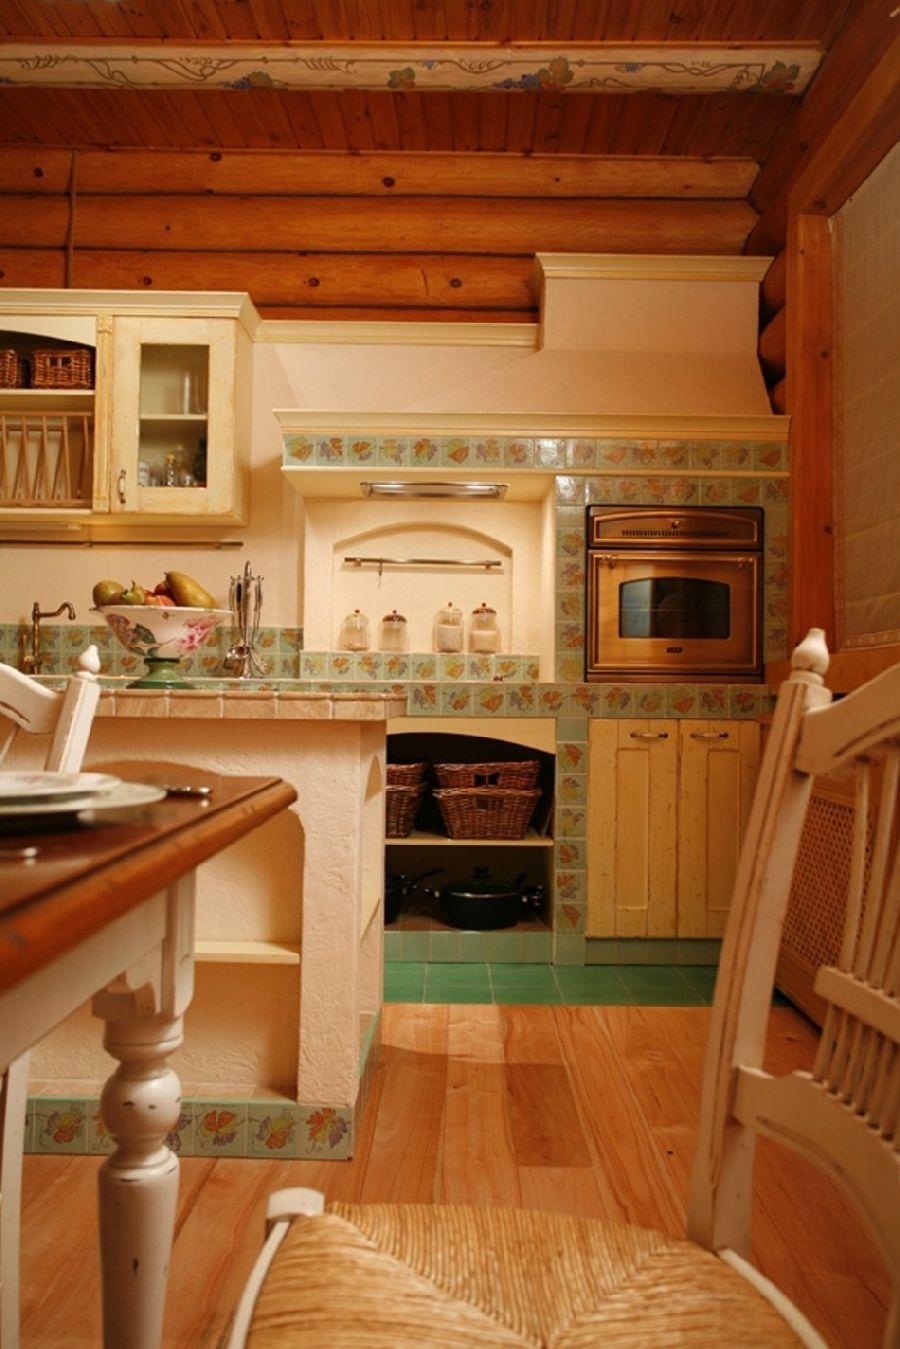 adelaparvu.com despre casa din barne de lemn, casa Rusia 192 mp, designer interior Svetlana Panarin, Foto Evgeniy Kylibaba, Gregory Yashuhin (16)